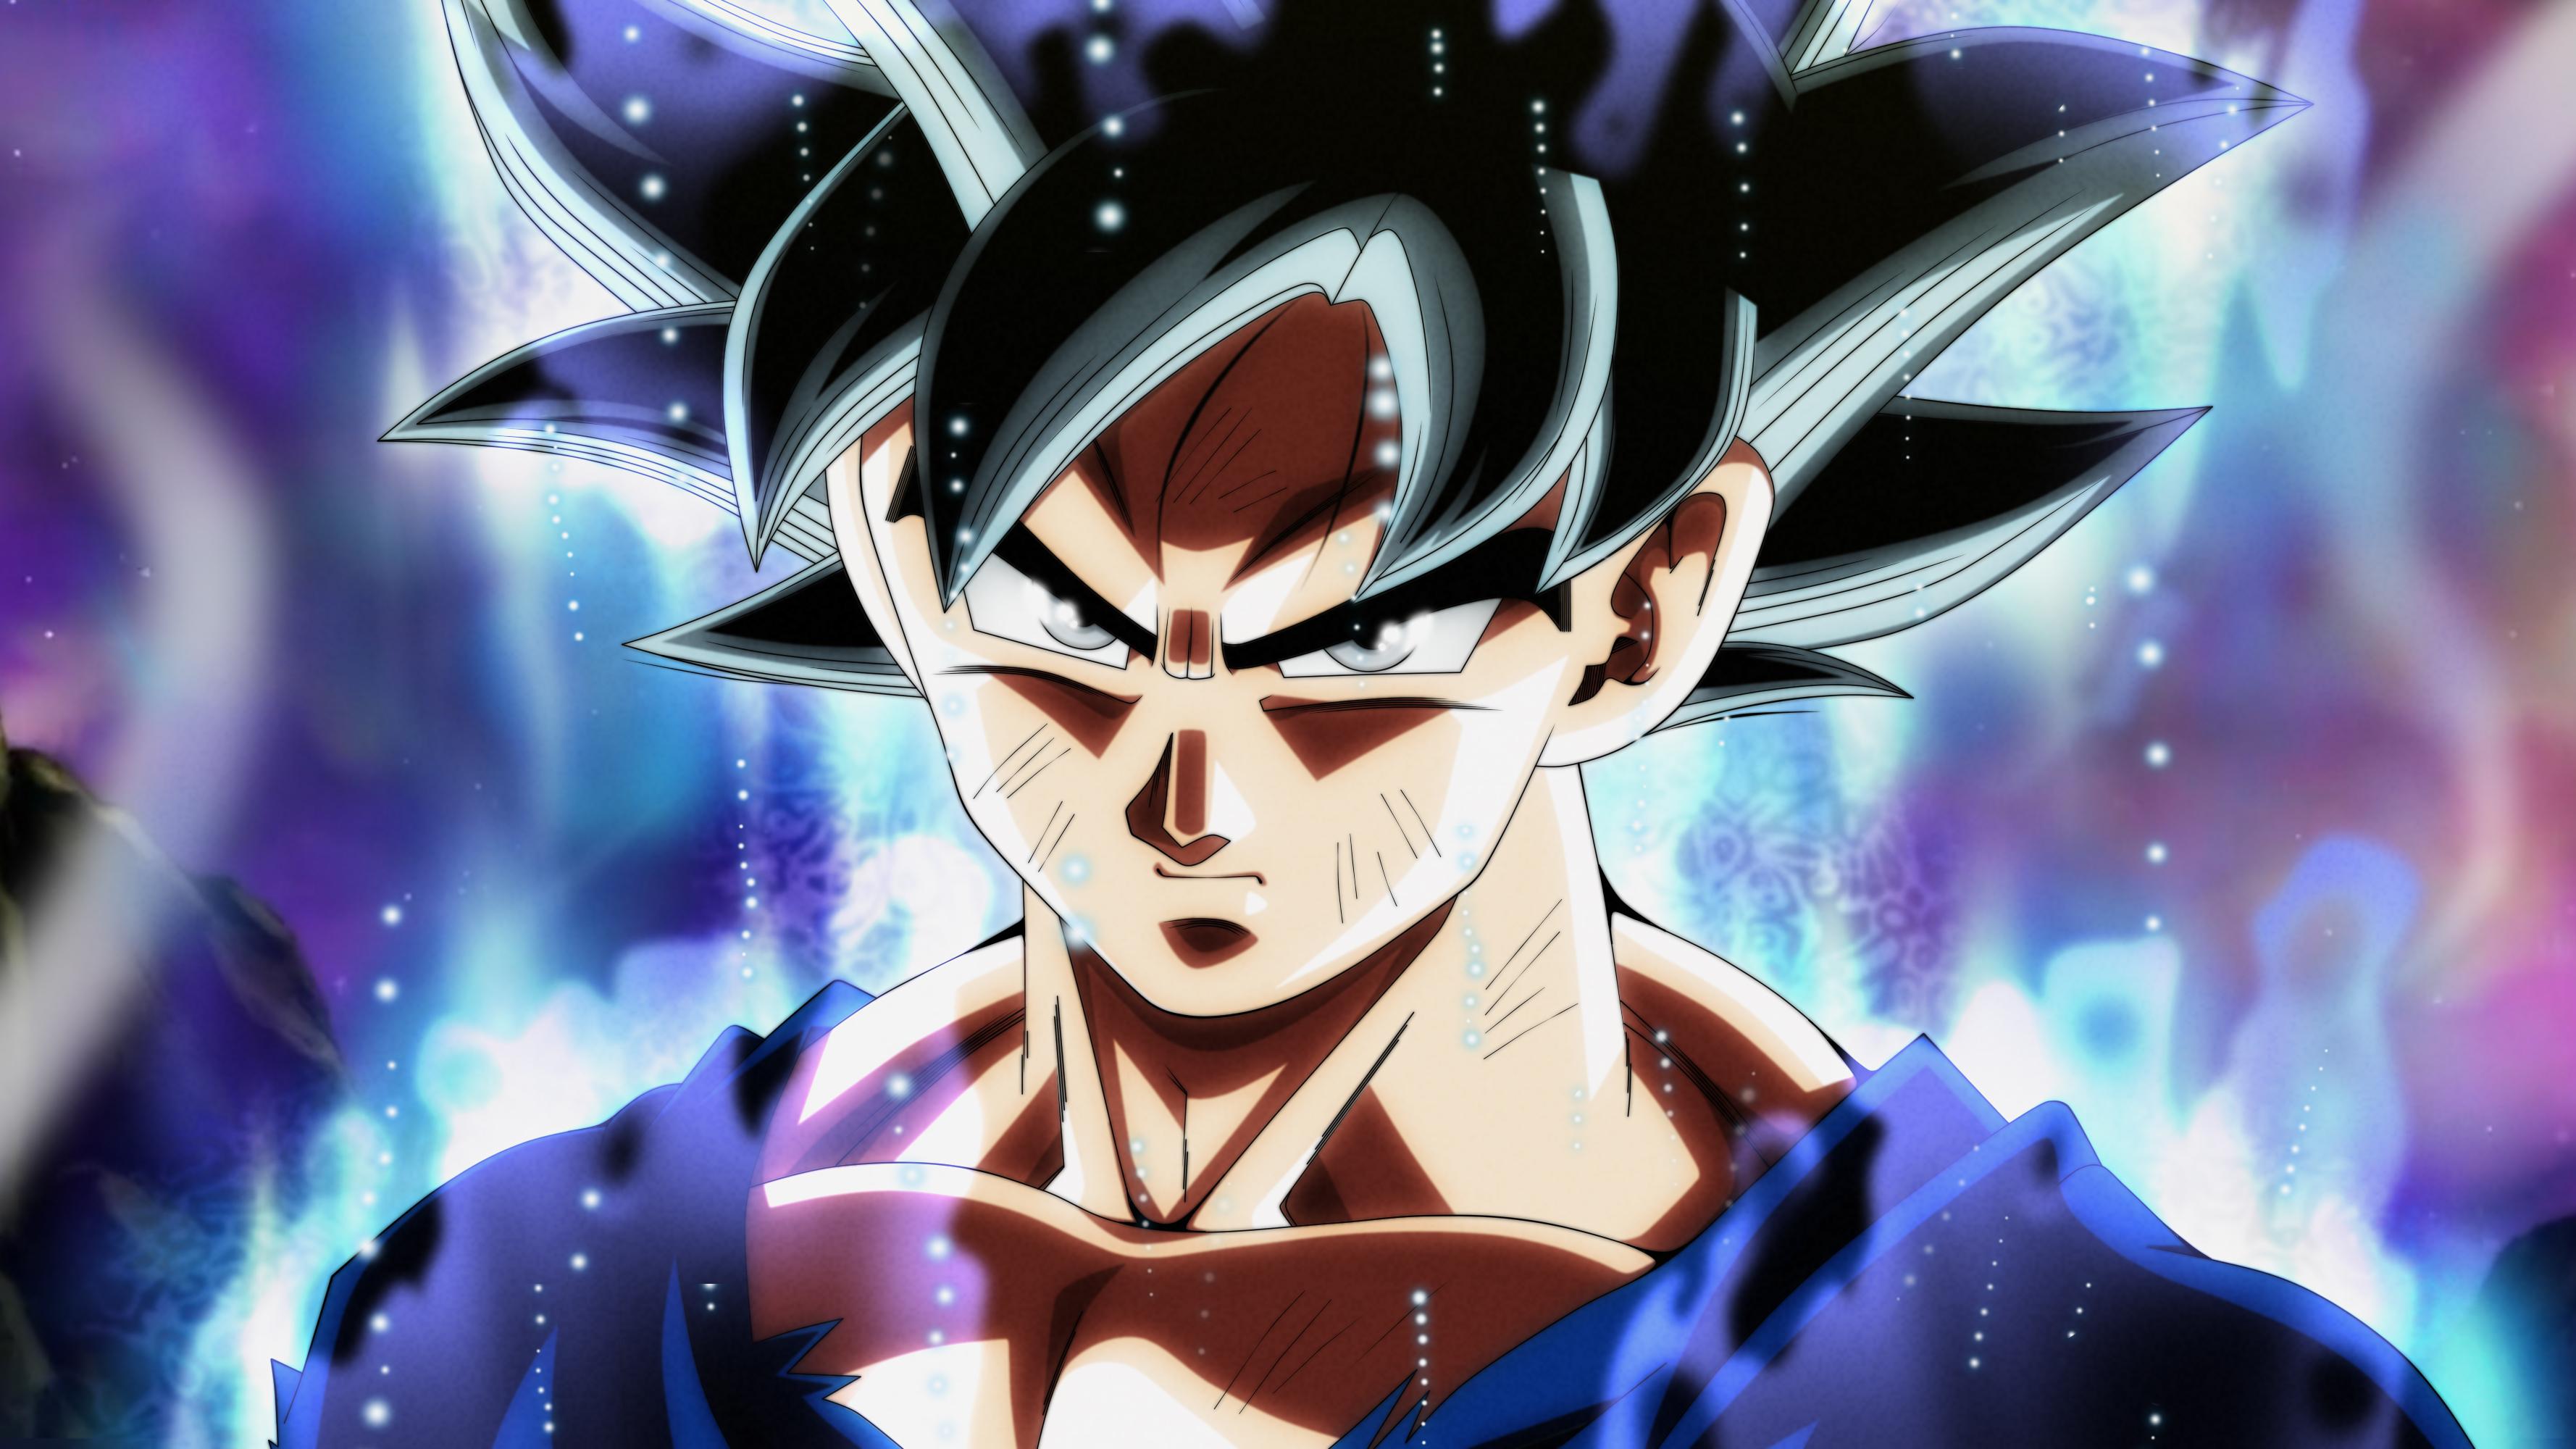 Dragon Ball Super Ultra Instinct Wallpaper: Ultra Instinct Dragon Ball Super, HD Anime, 4k Wallpapers